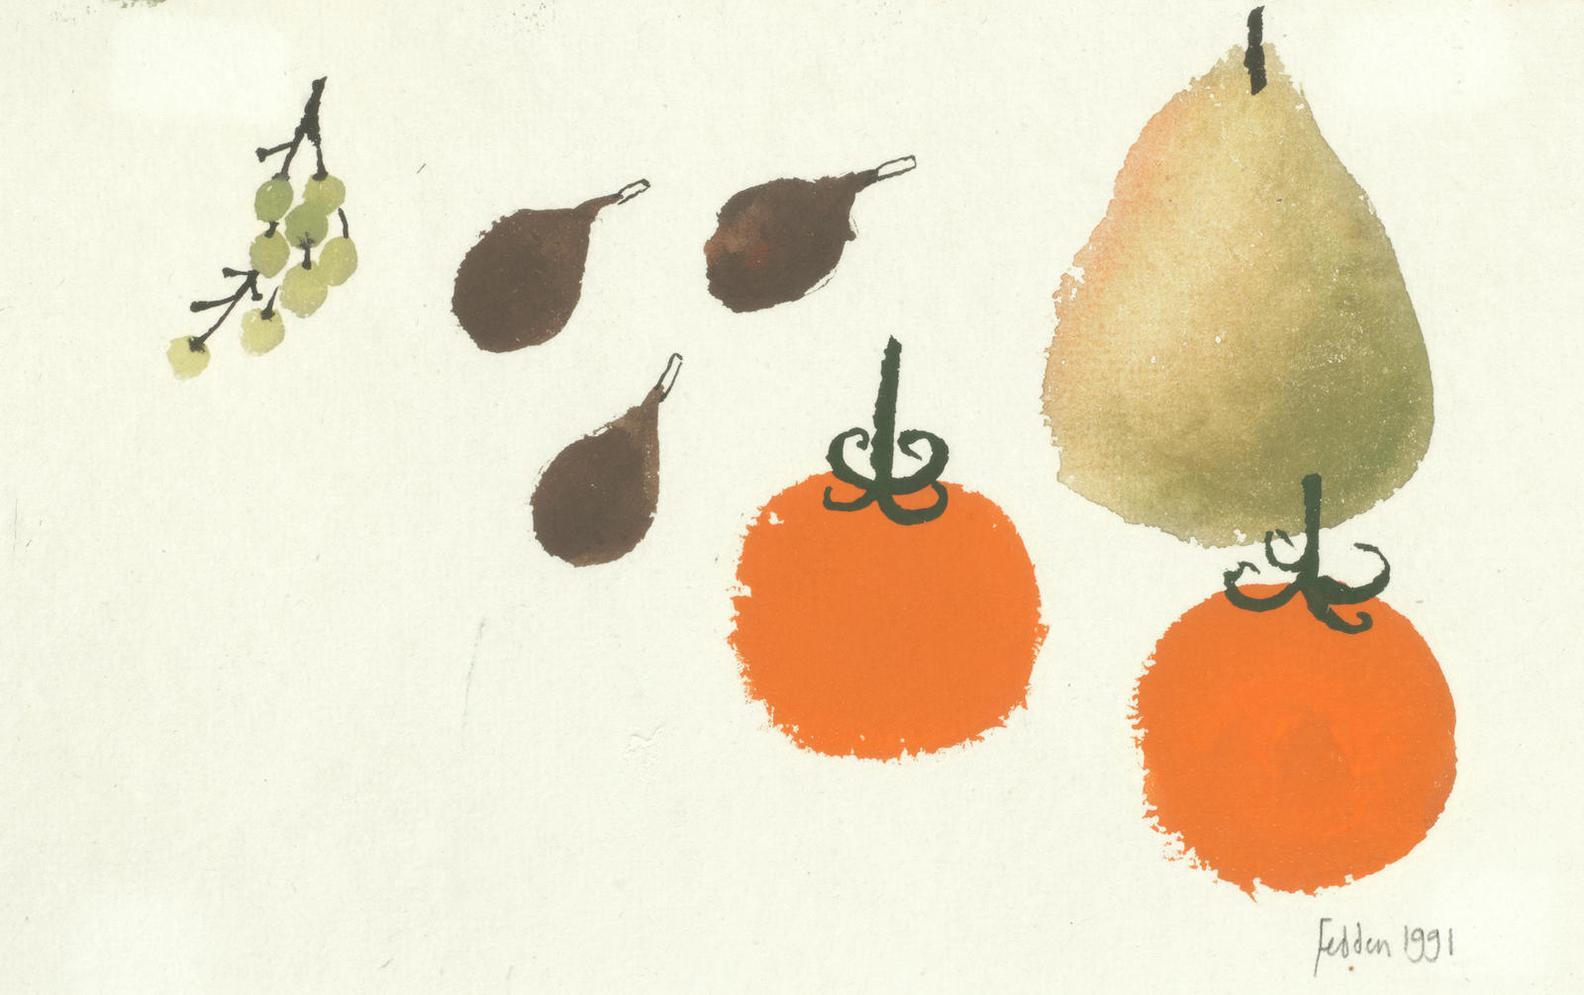 Mary Fedden - Fruit-1991